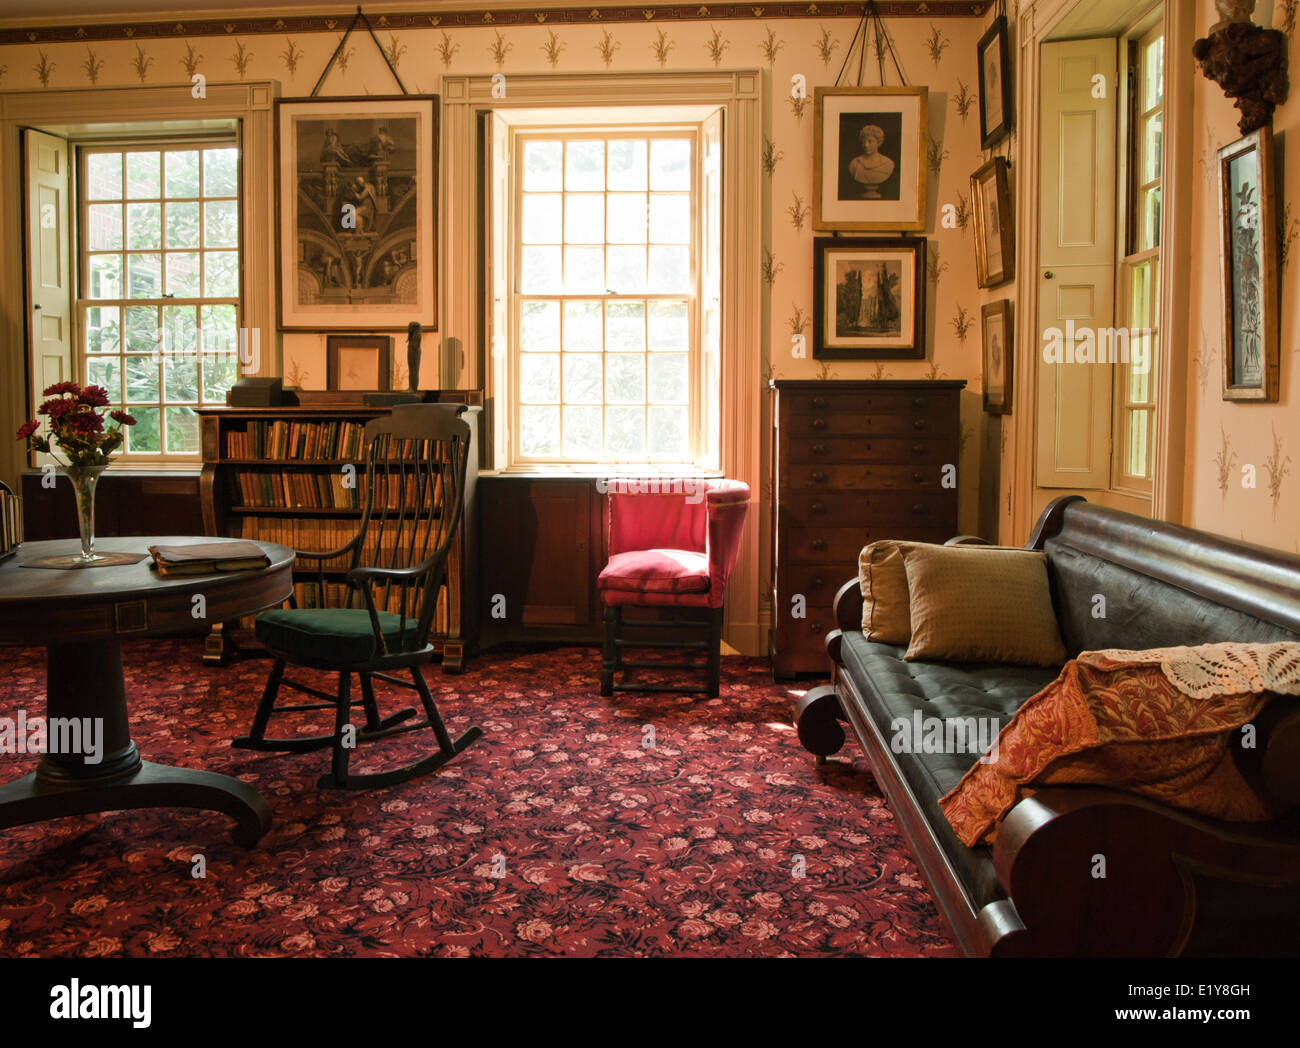 Stately Home Interior Wallpaper Stock Photos Amp Stately